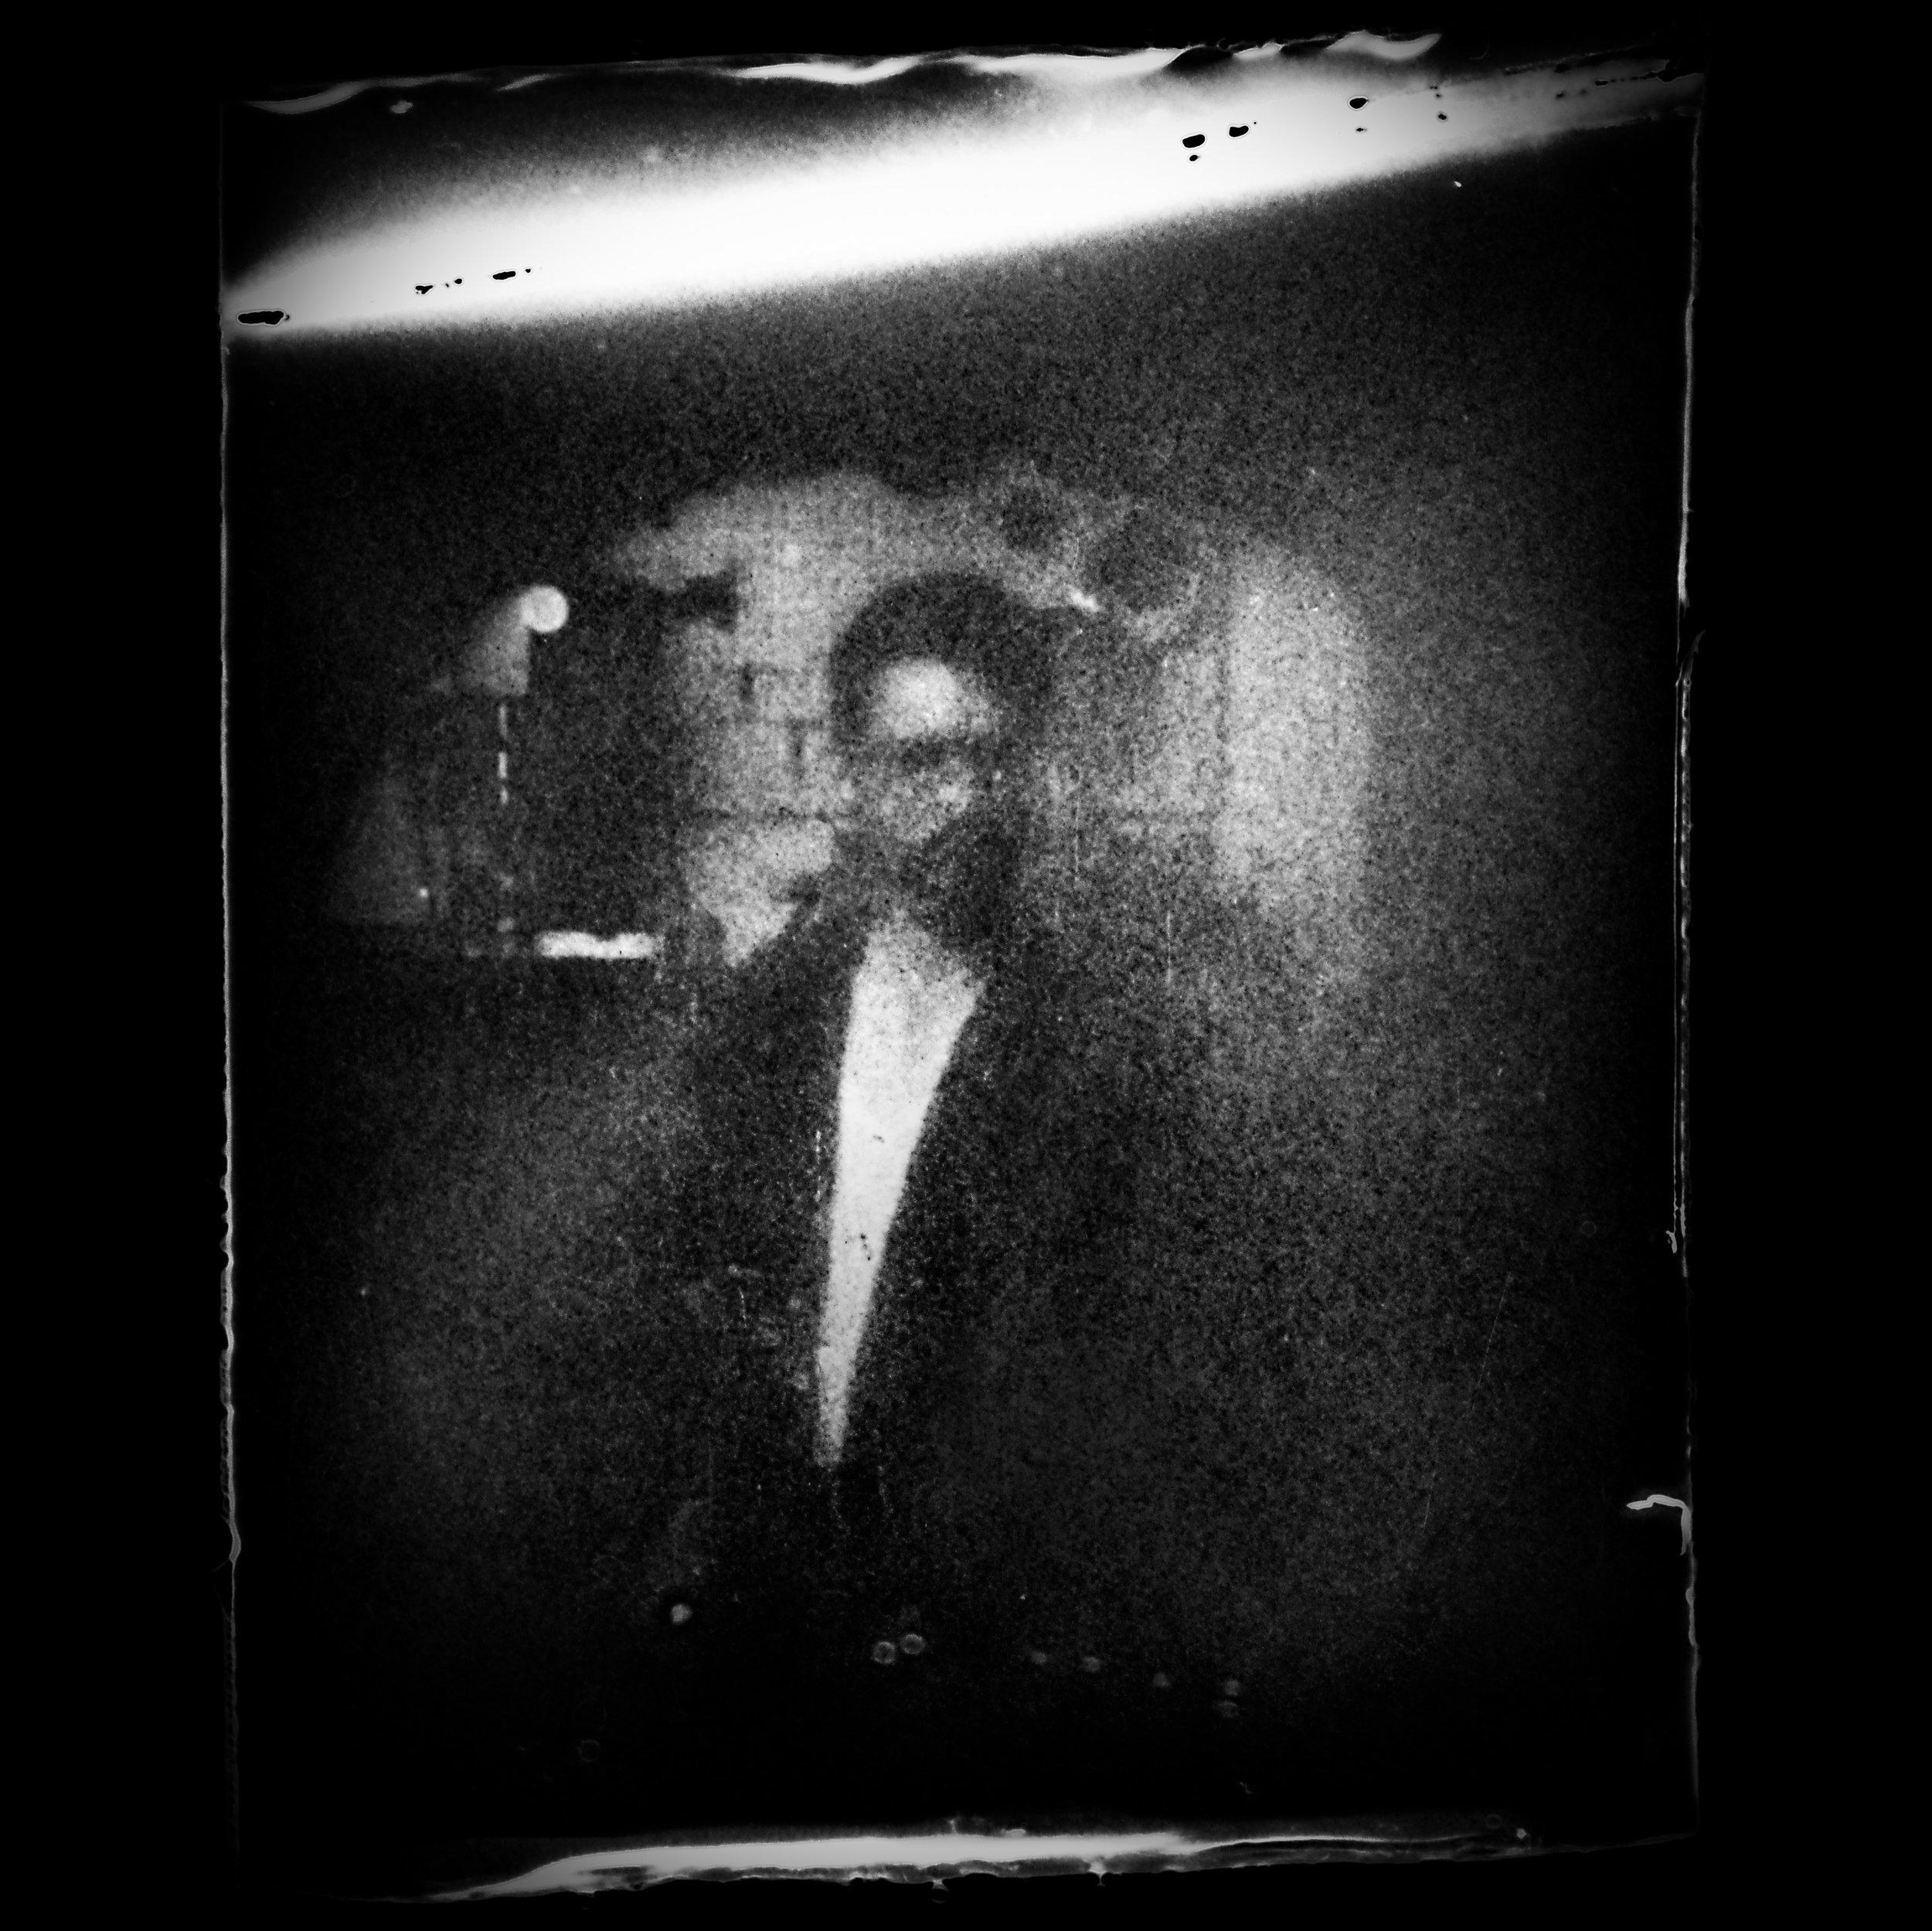 LucusLanders_Miniview_Self_Portrait.jpg